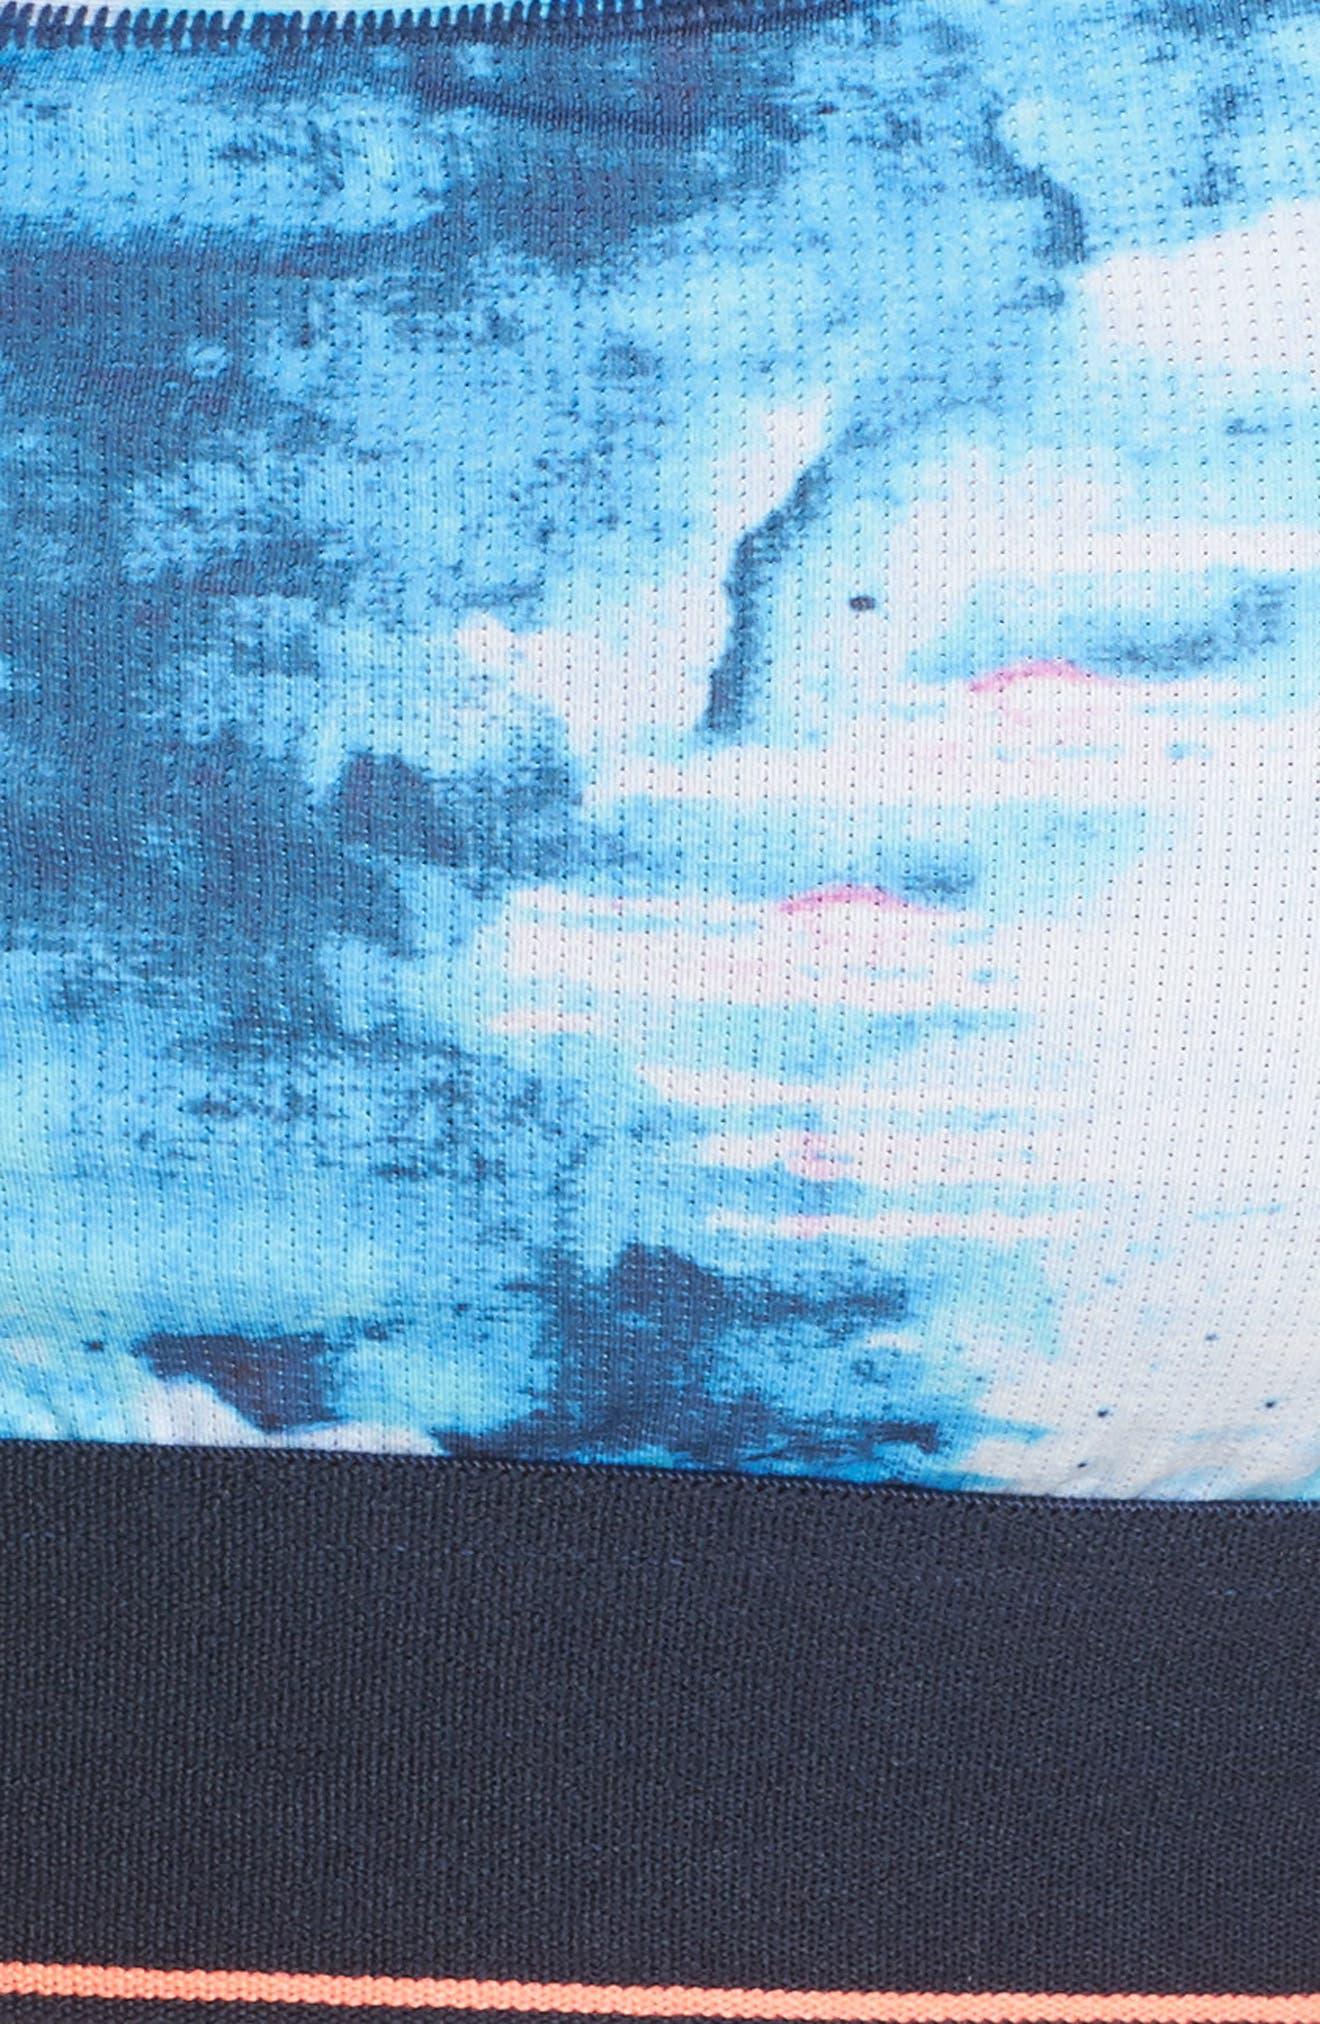 Tropic Storm Tomboy Bralette,                             Alternate thumbnail 9, color,                             Navy